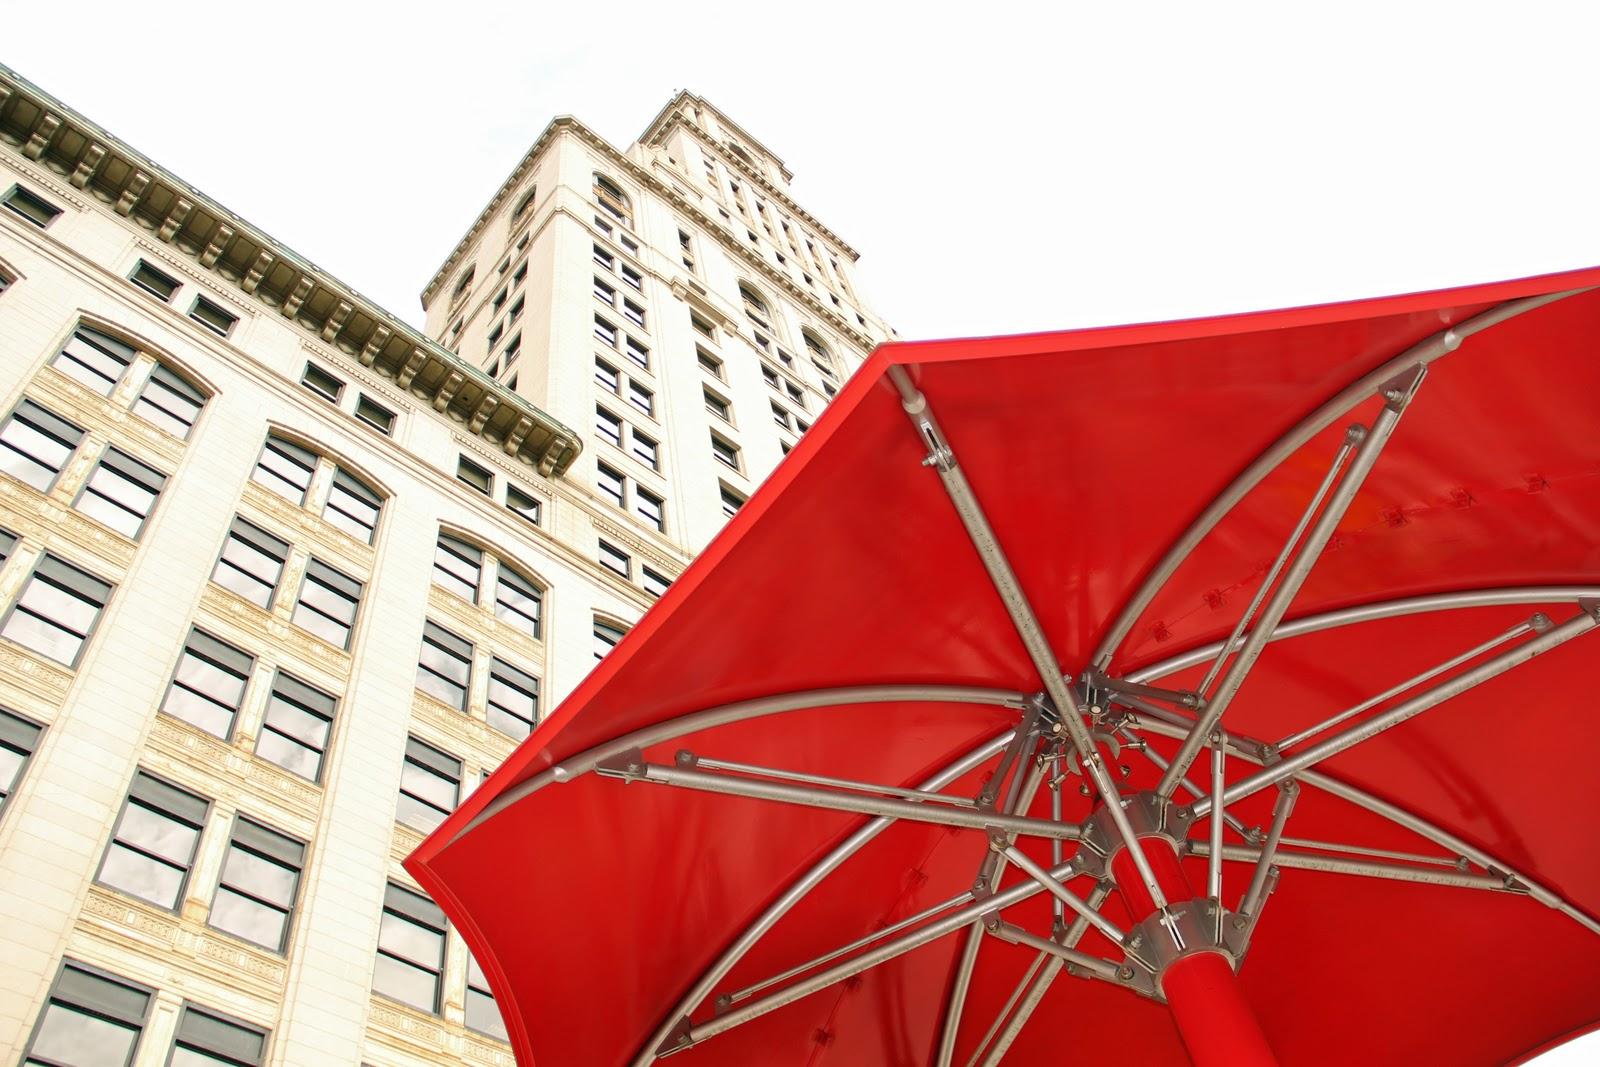 Naples And Hartford In Season  The Travelers U0026 39  Red Umbrella